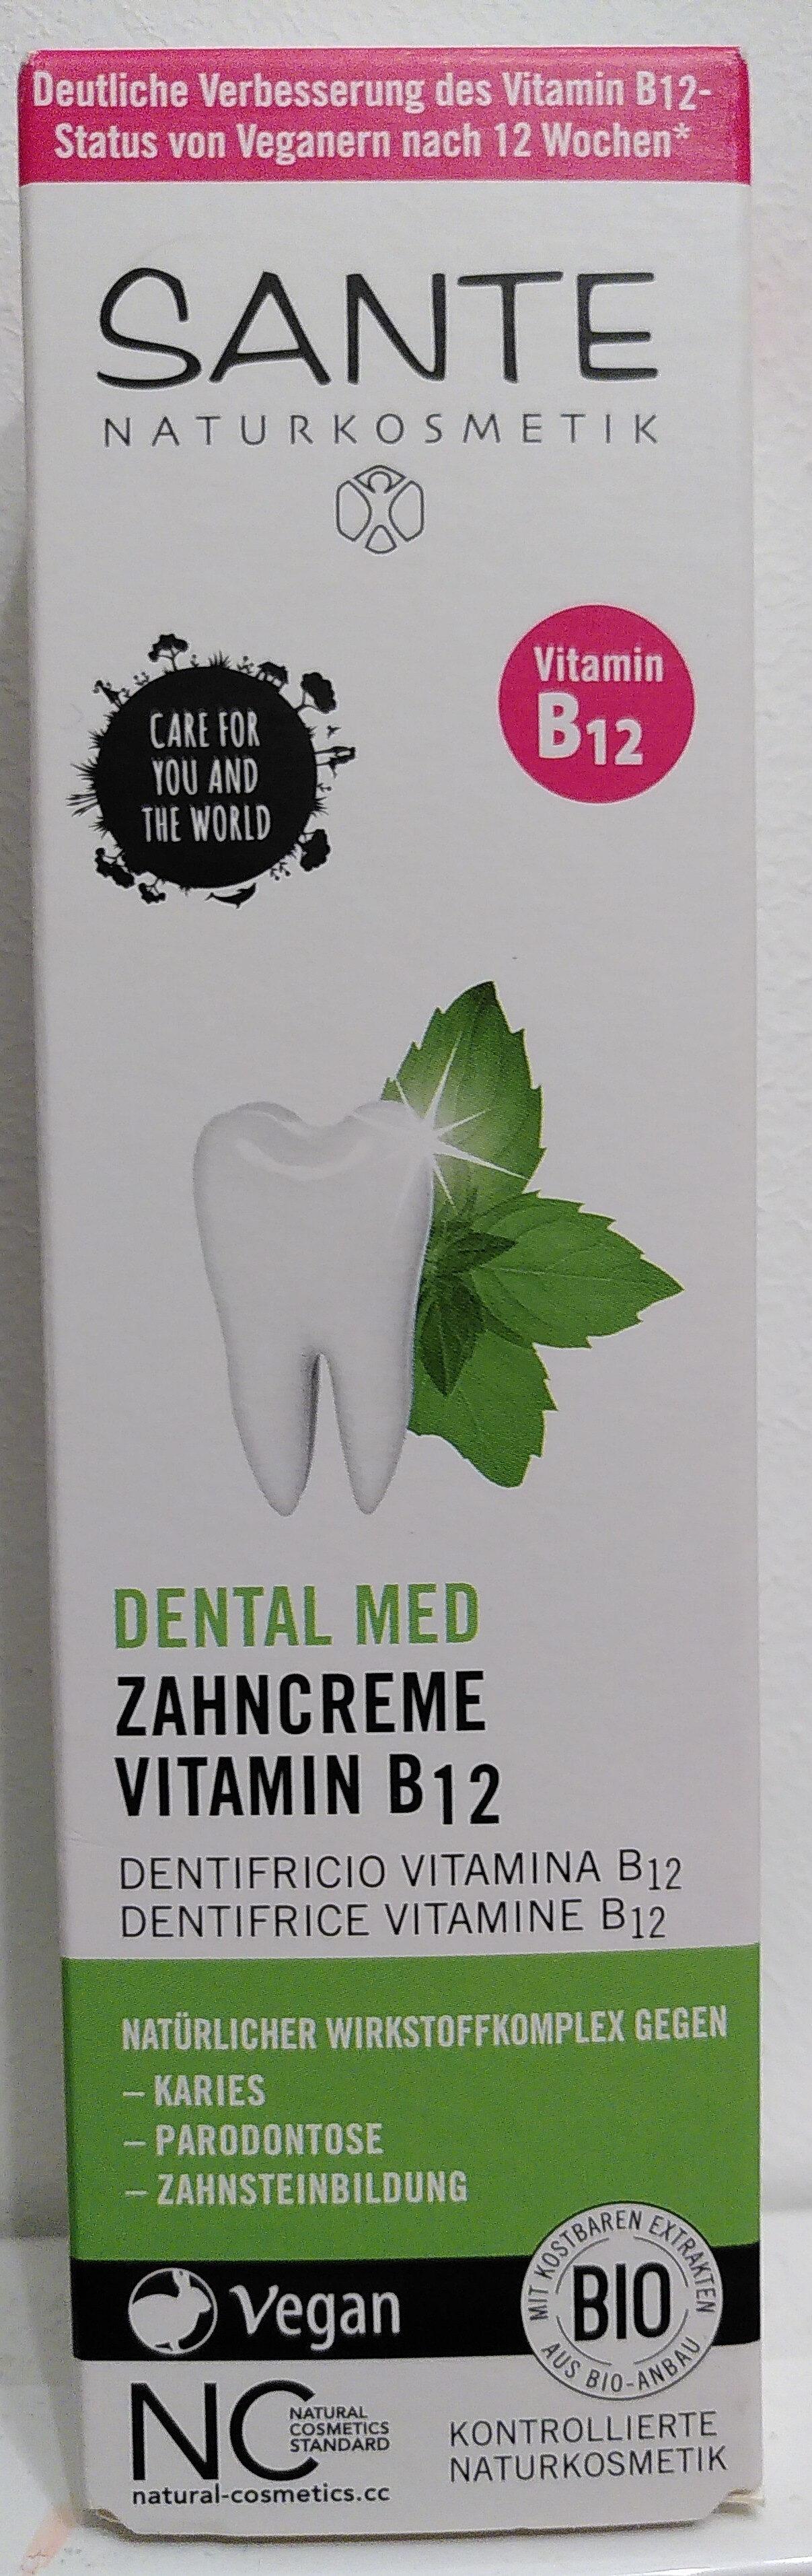 Dental Med Zahncreme Vitamin B12 - Produit - de